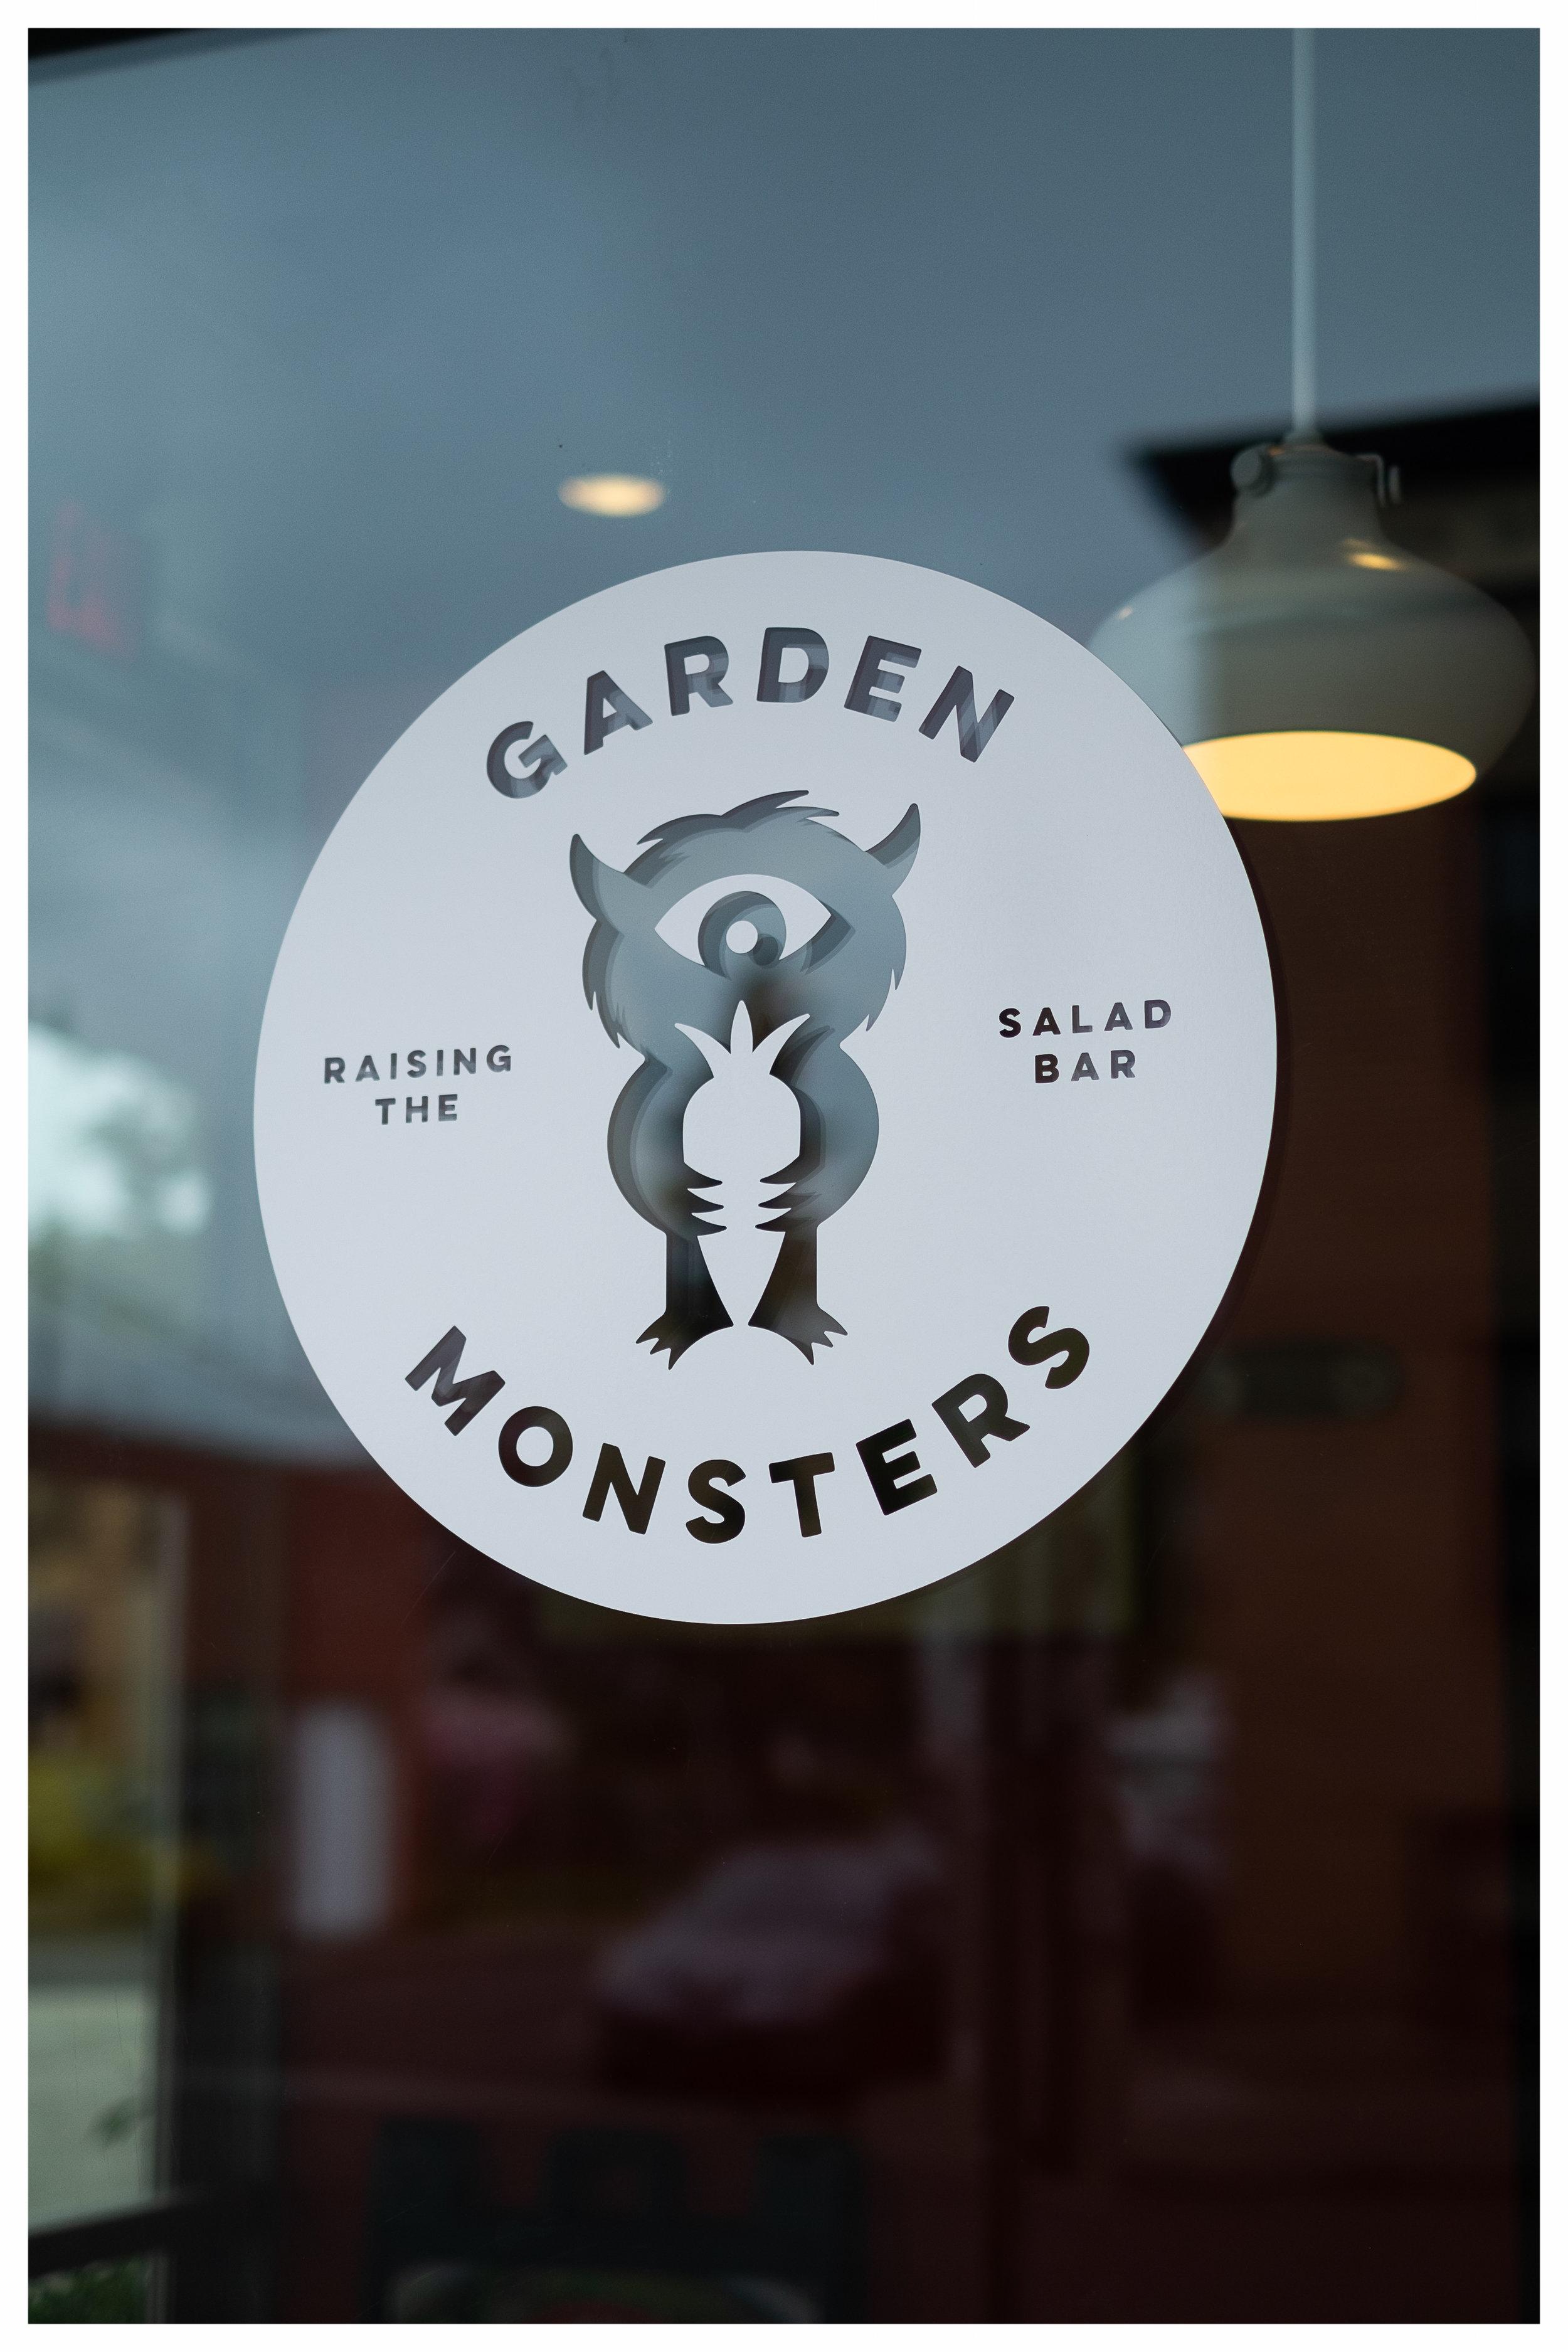 GardenMonsters-009.jpg